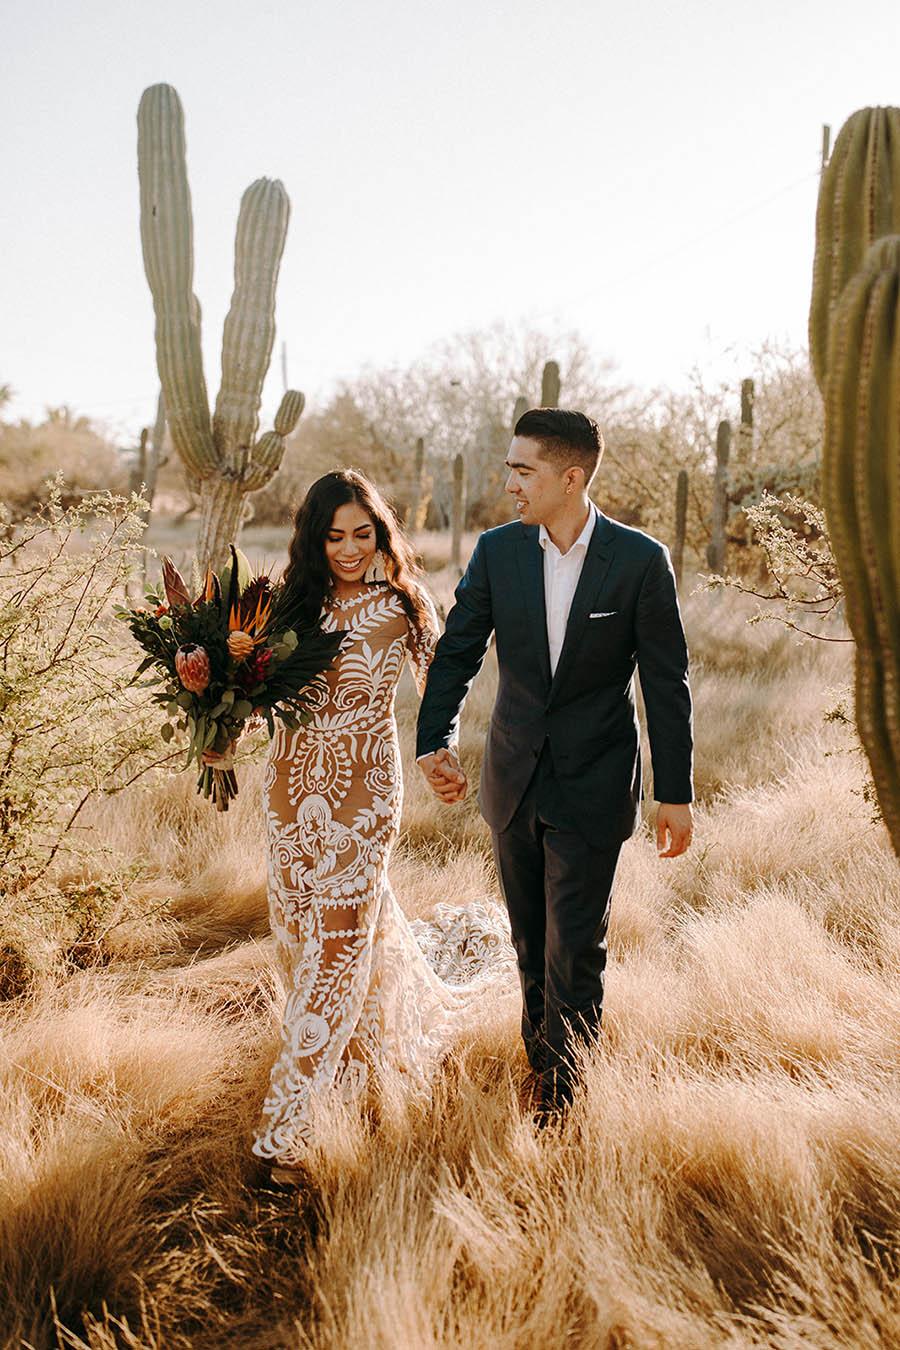 Wedding Couple walking in-between cactuses